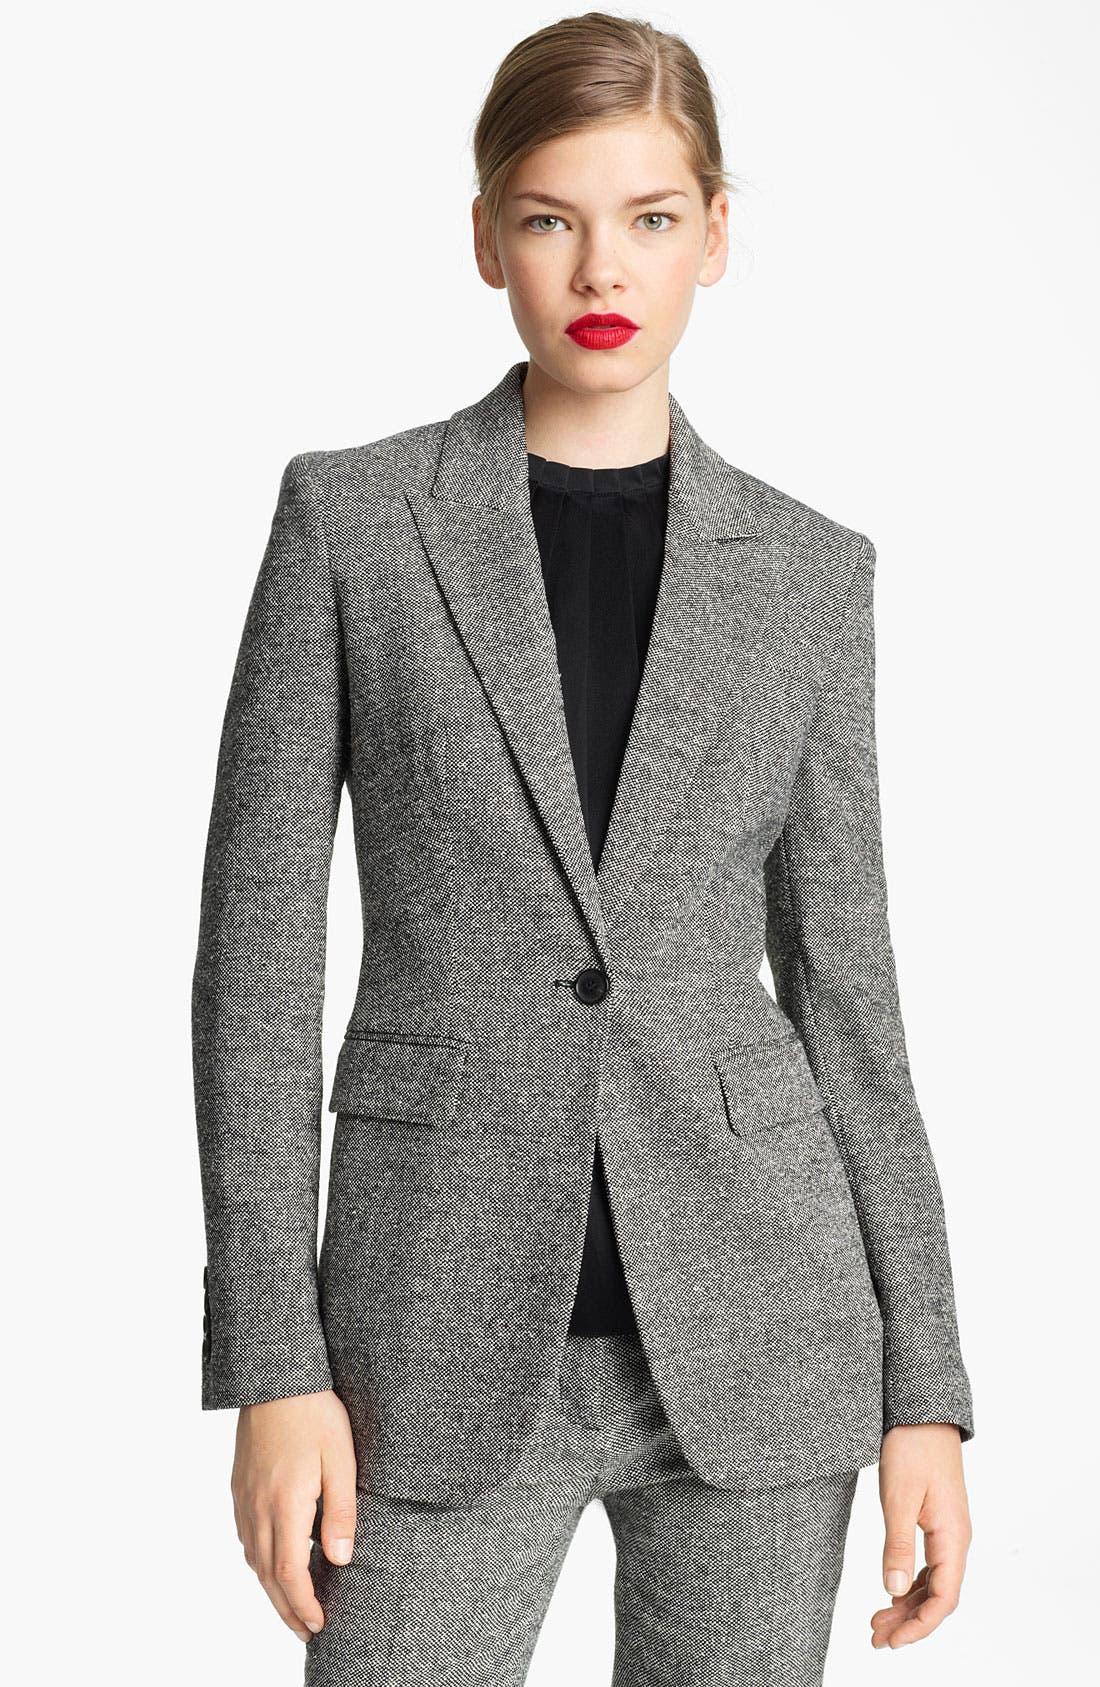 Main Image - Michael Kors Donegal Tweed Blazer